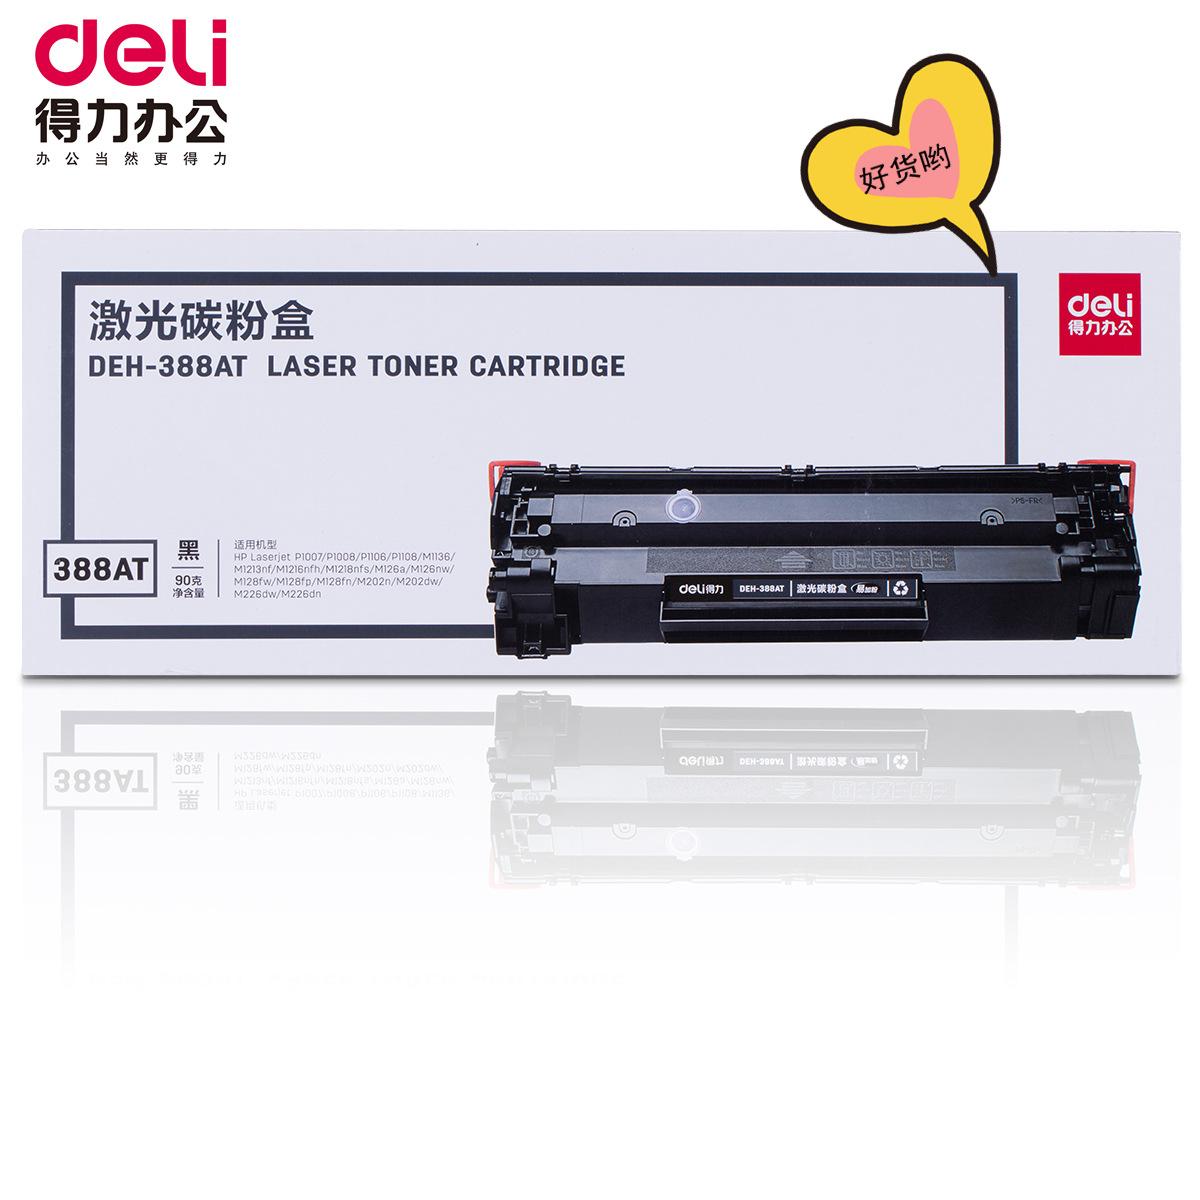 DELI Hộp mực than máy in laser deli Sử dụng tốt máy in bộ chuyển đổi 388AT P1108 / P1007 / M